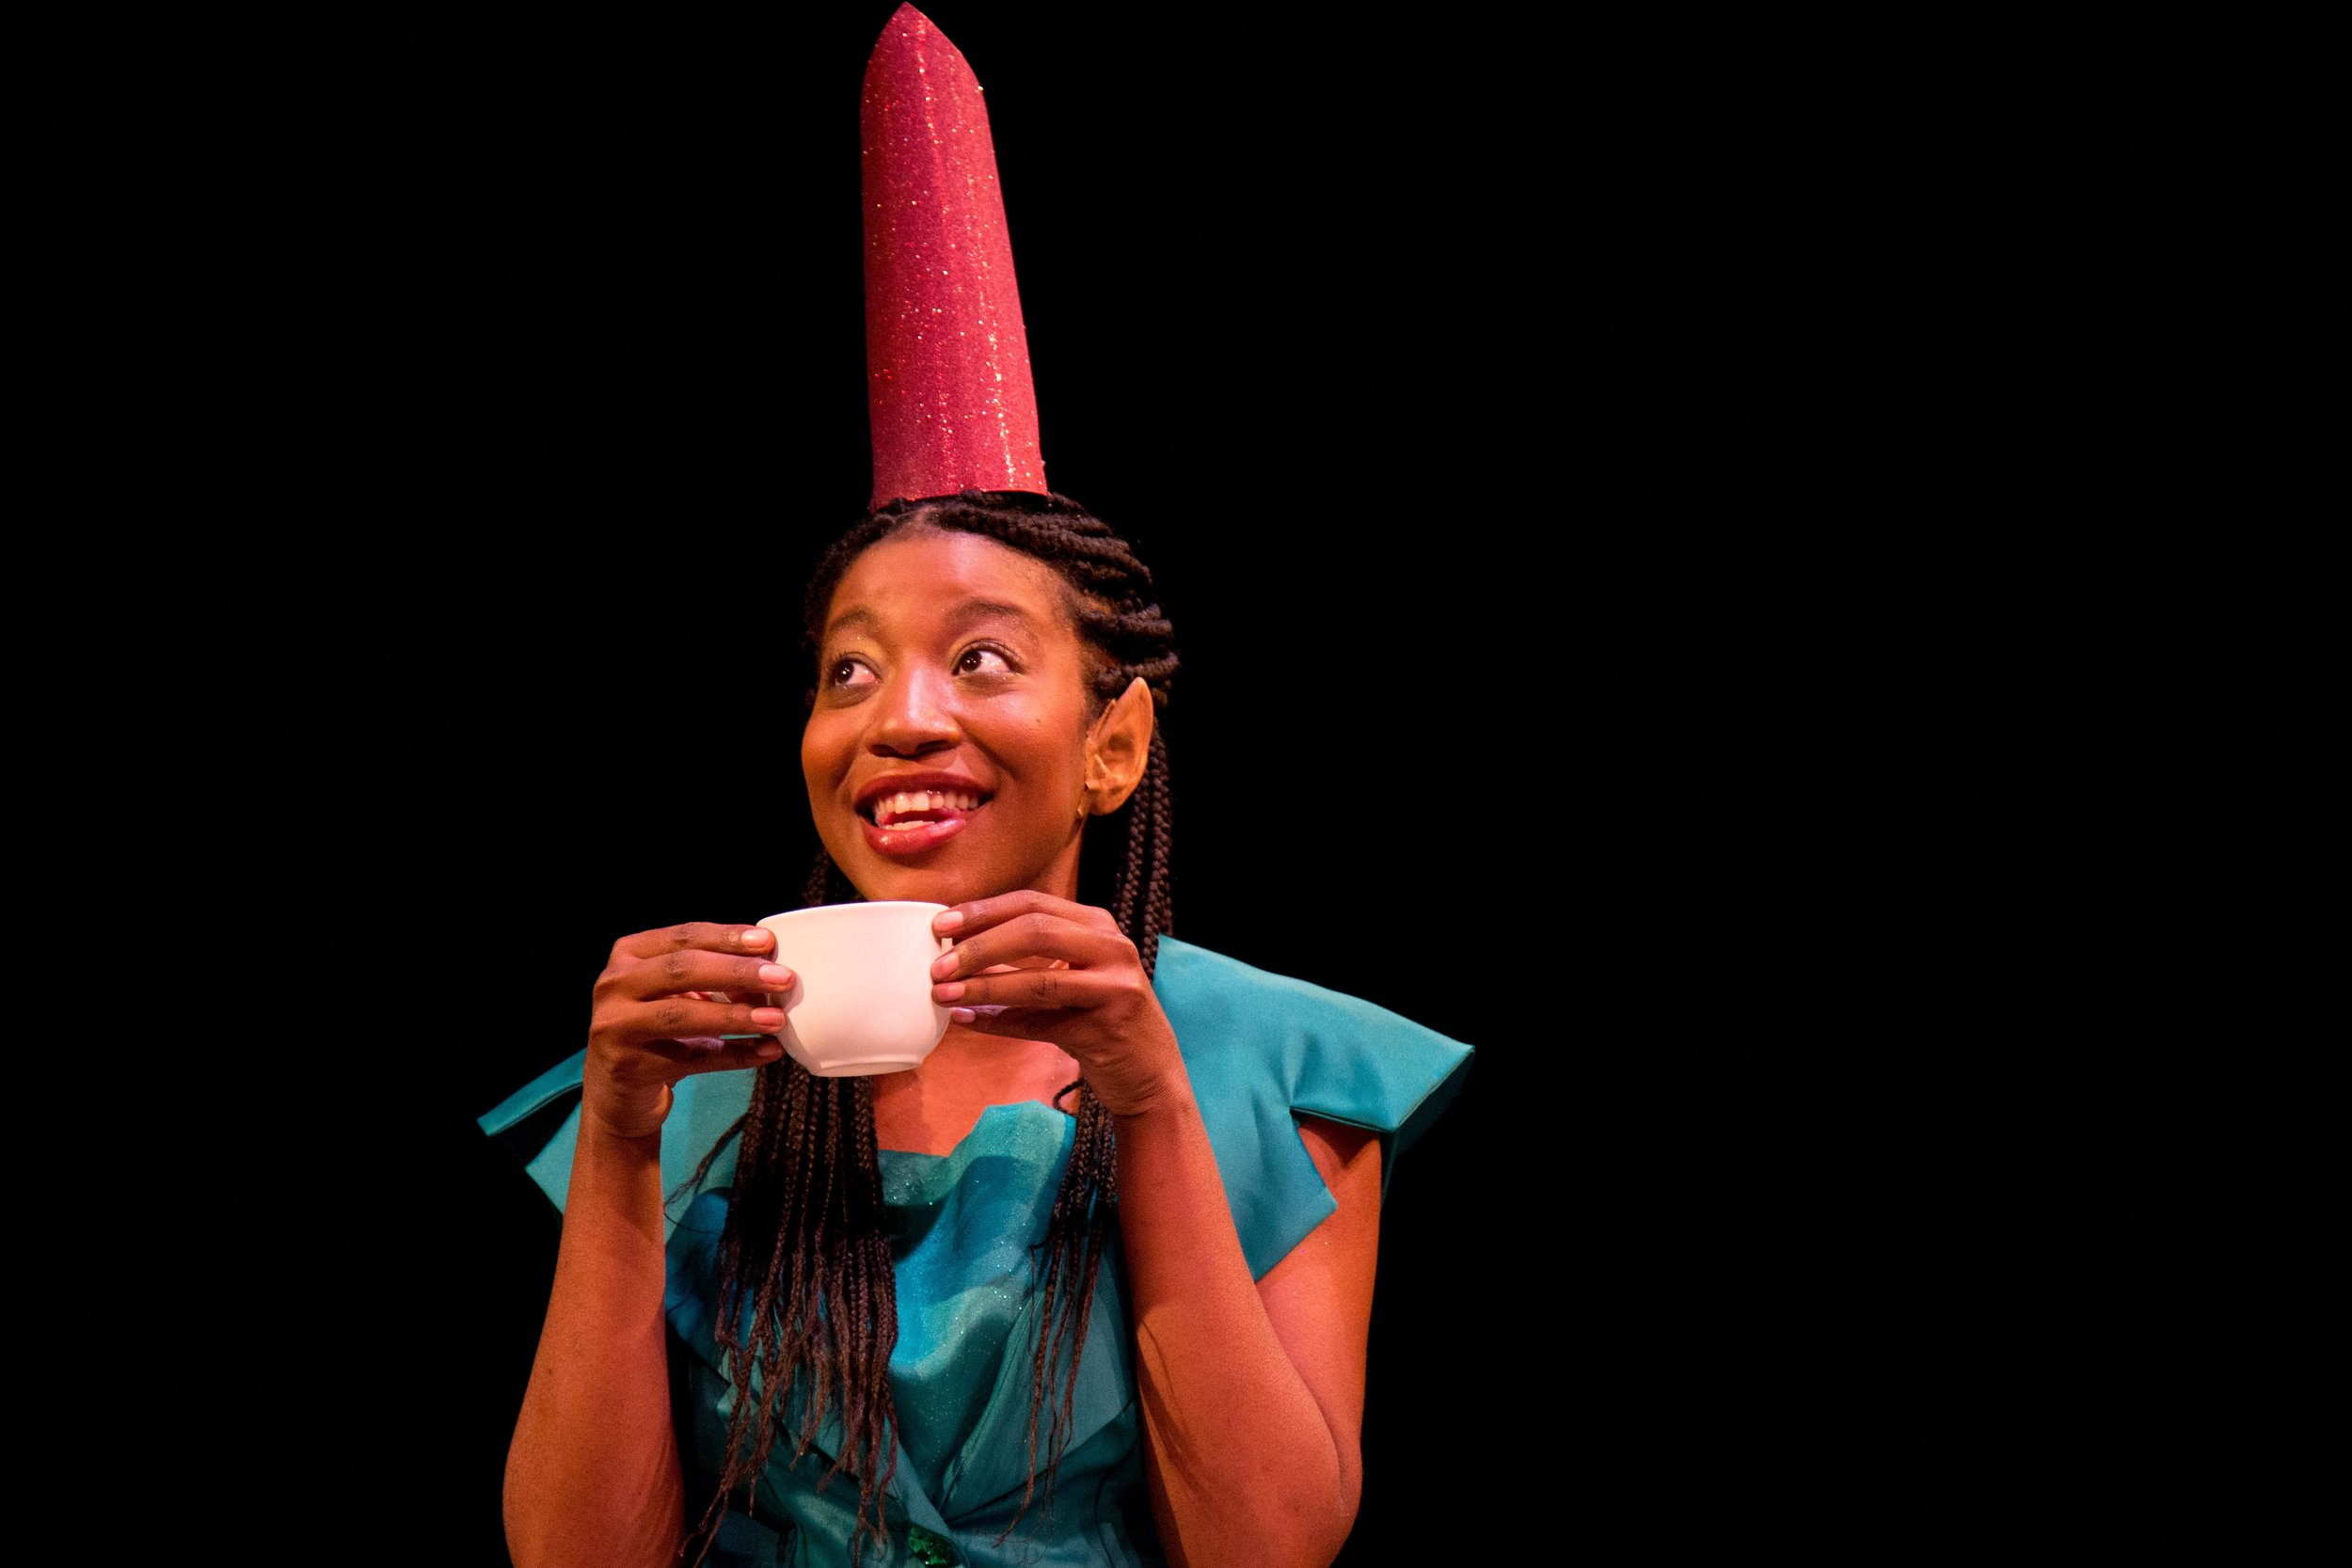 No Place Like Gnome by Ava Love Hanna